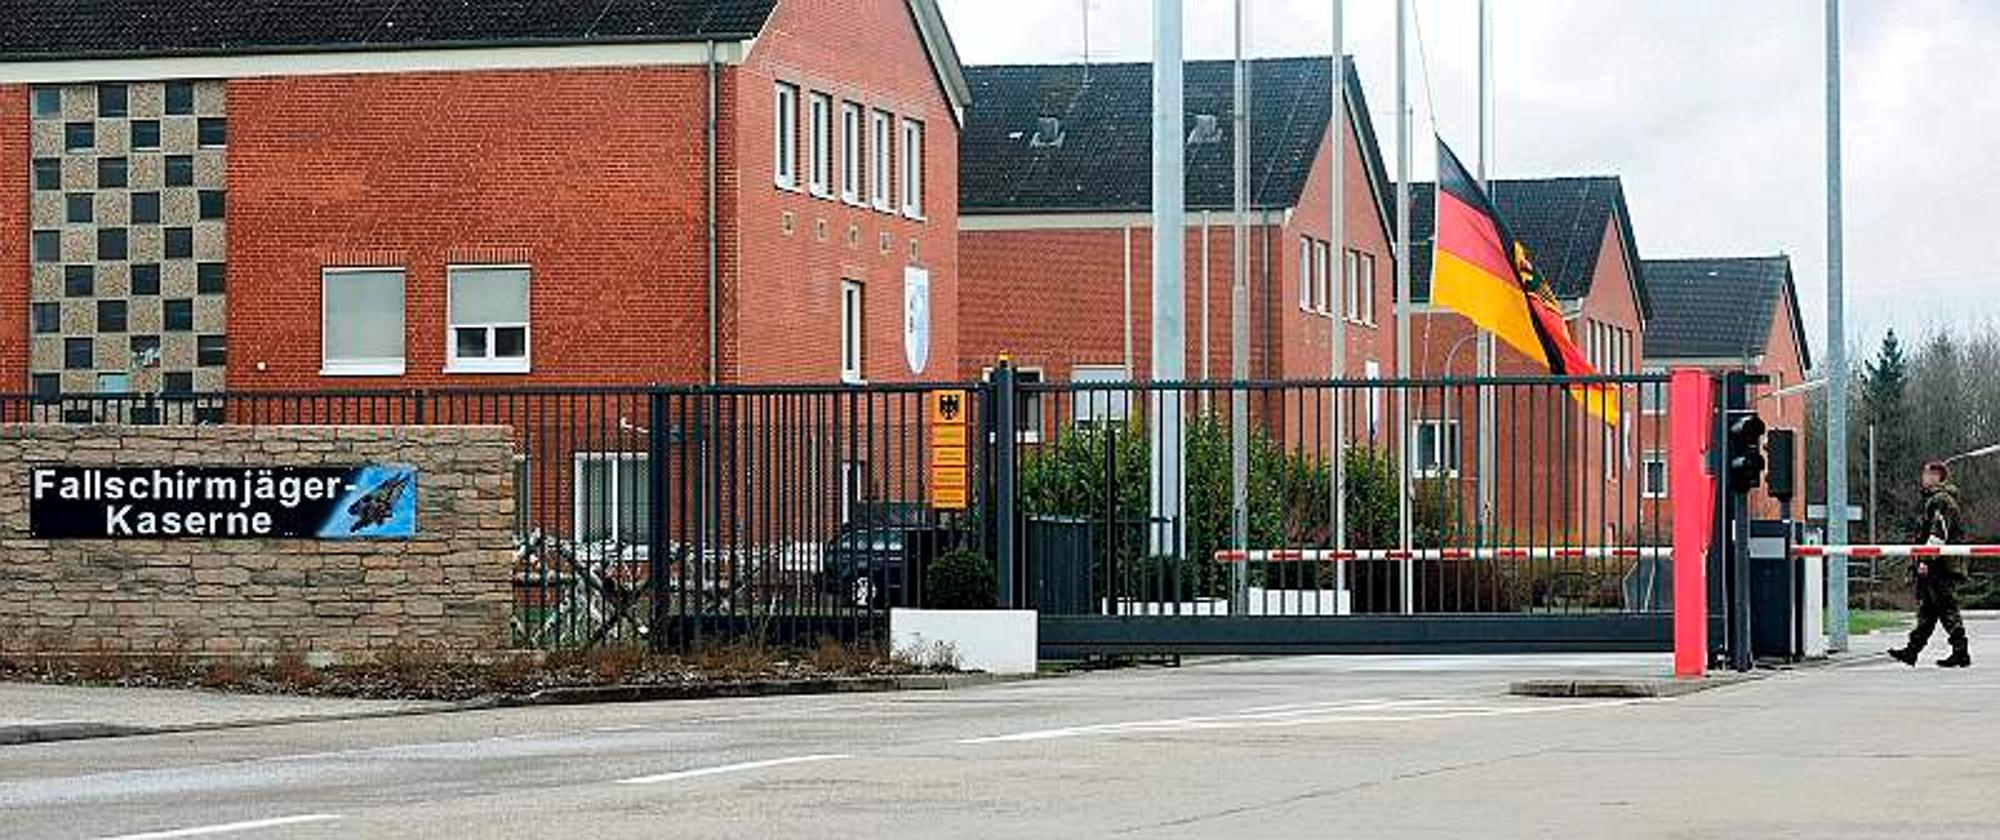 Seedorf Kaserne